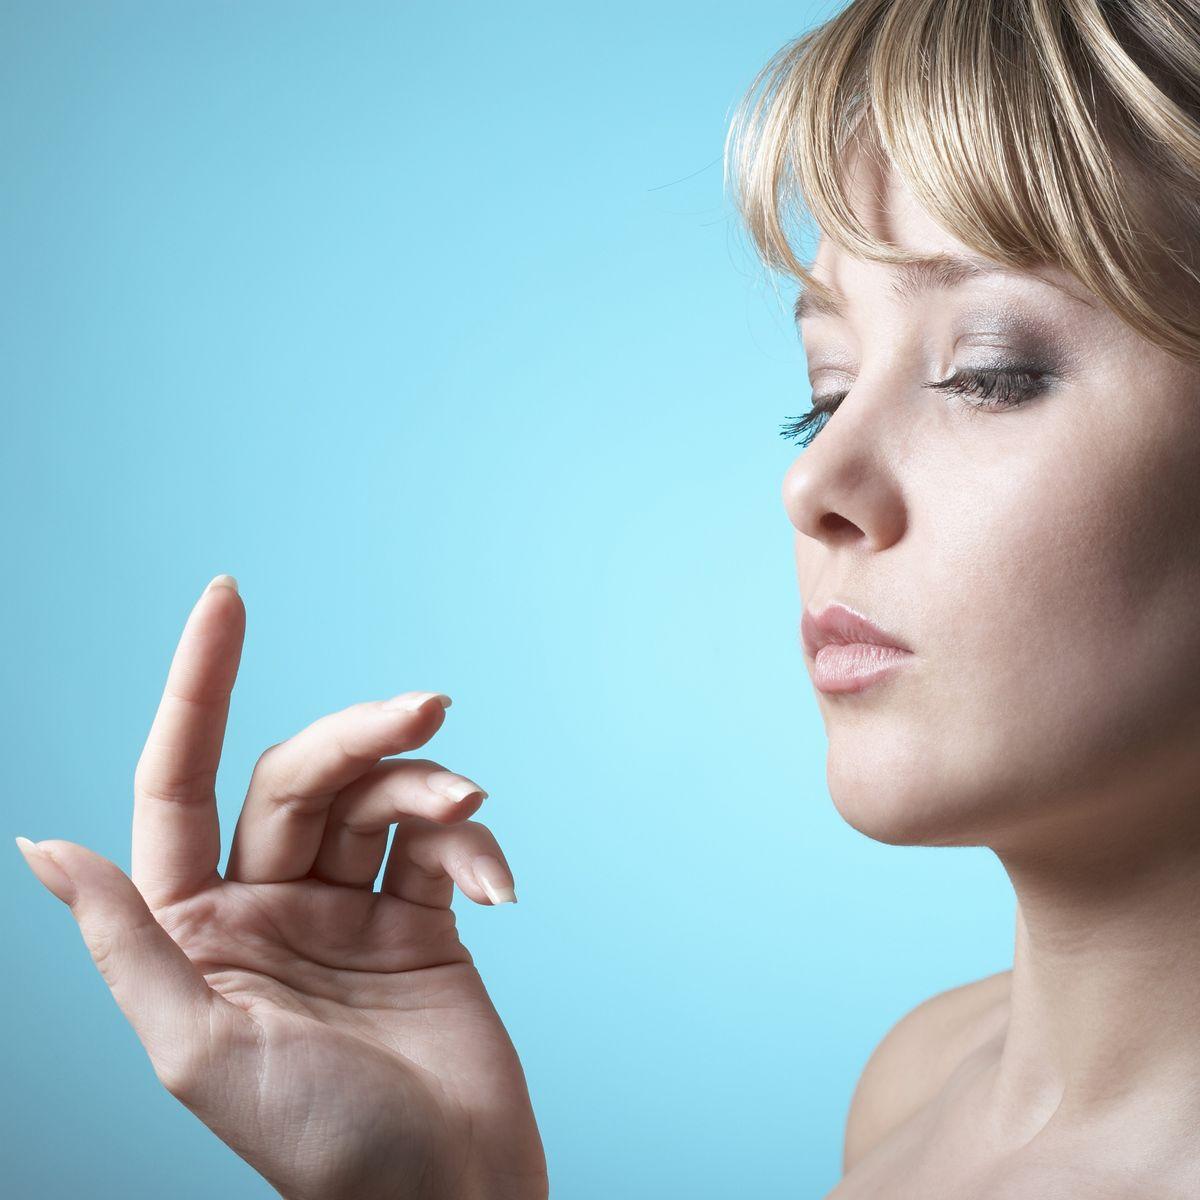 hausmittel gegen nagelbettentzündung